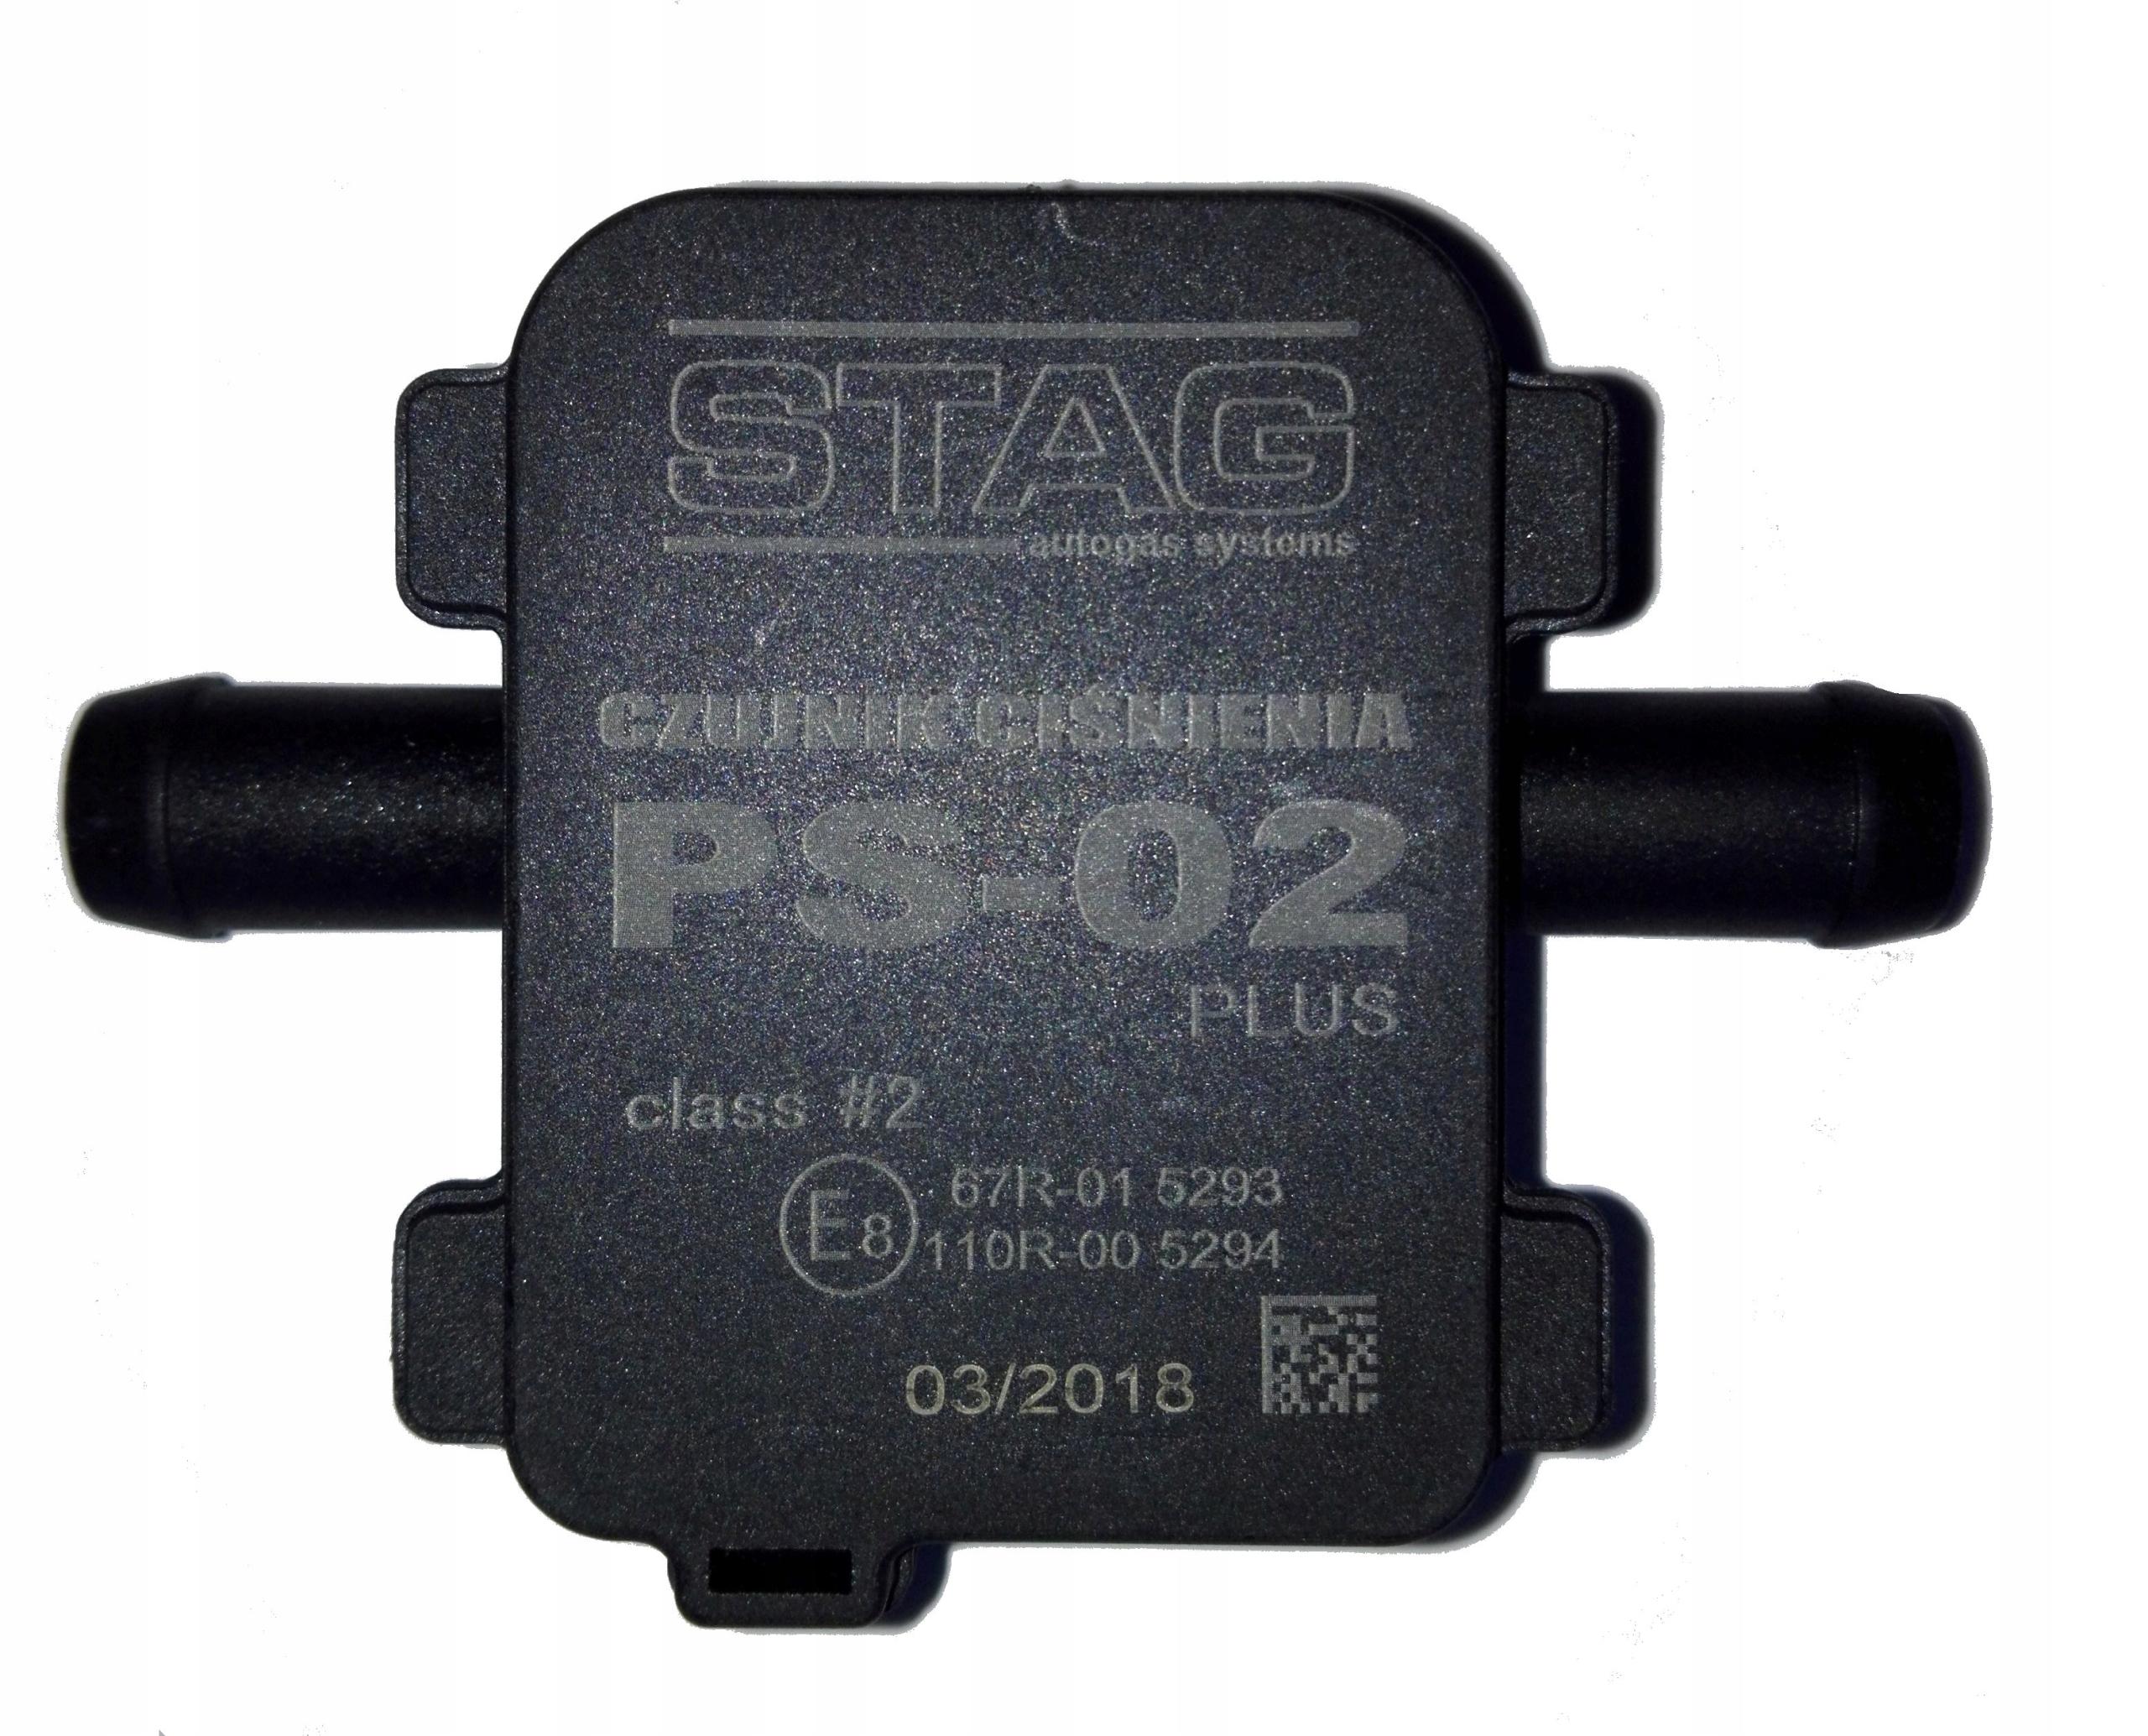 ac stag ps-02 mapsensor датчик давления газа снг